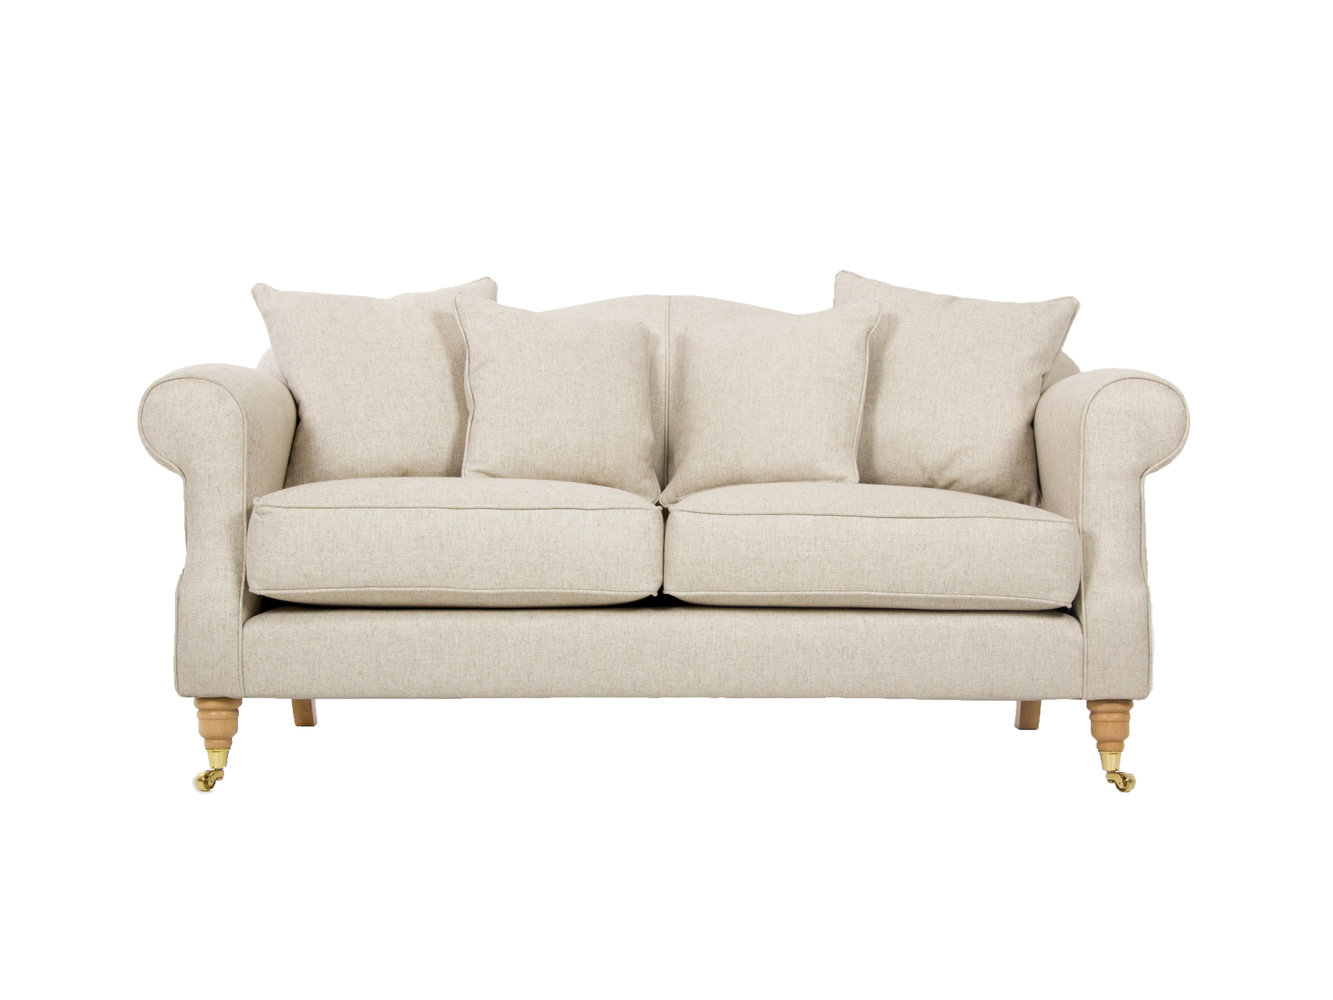 Guilgud Sofa